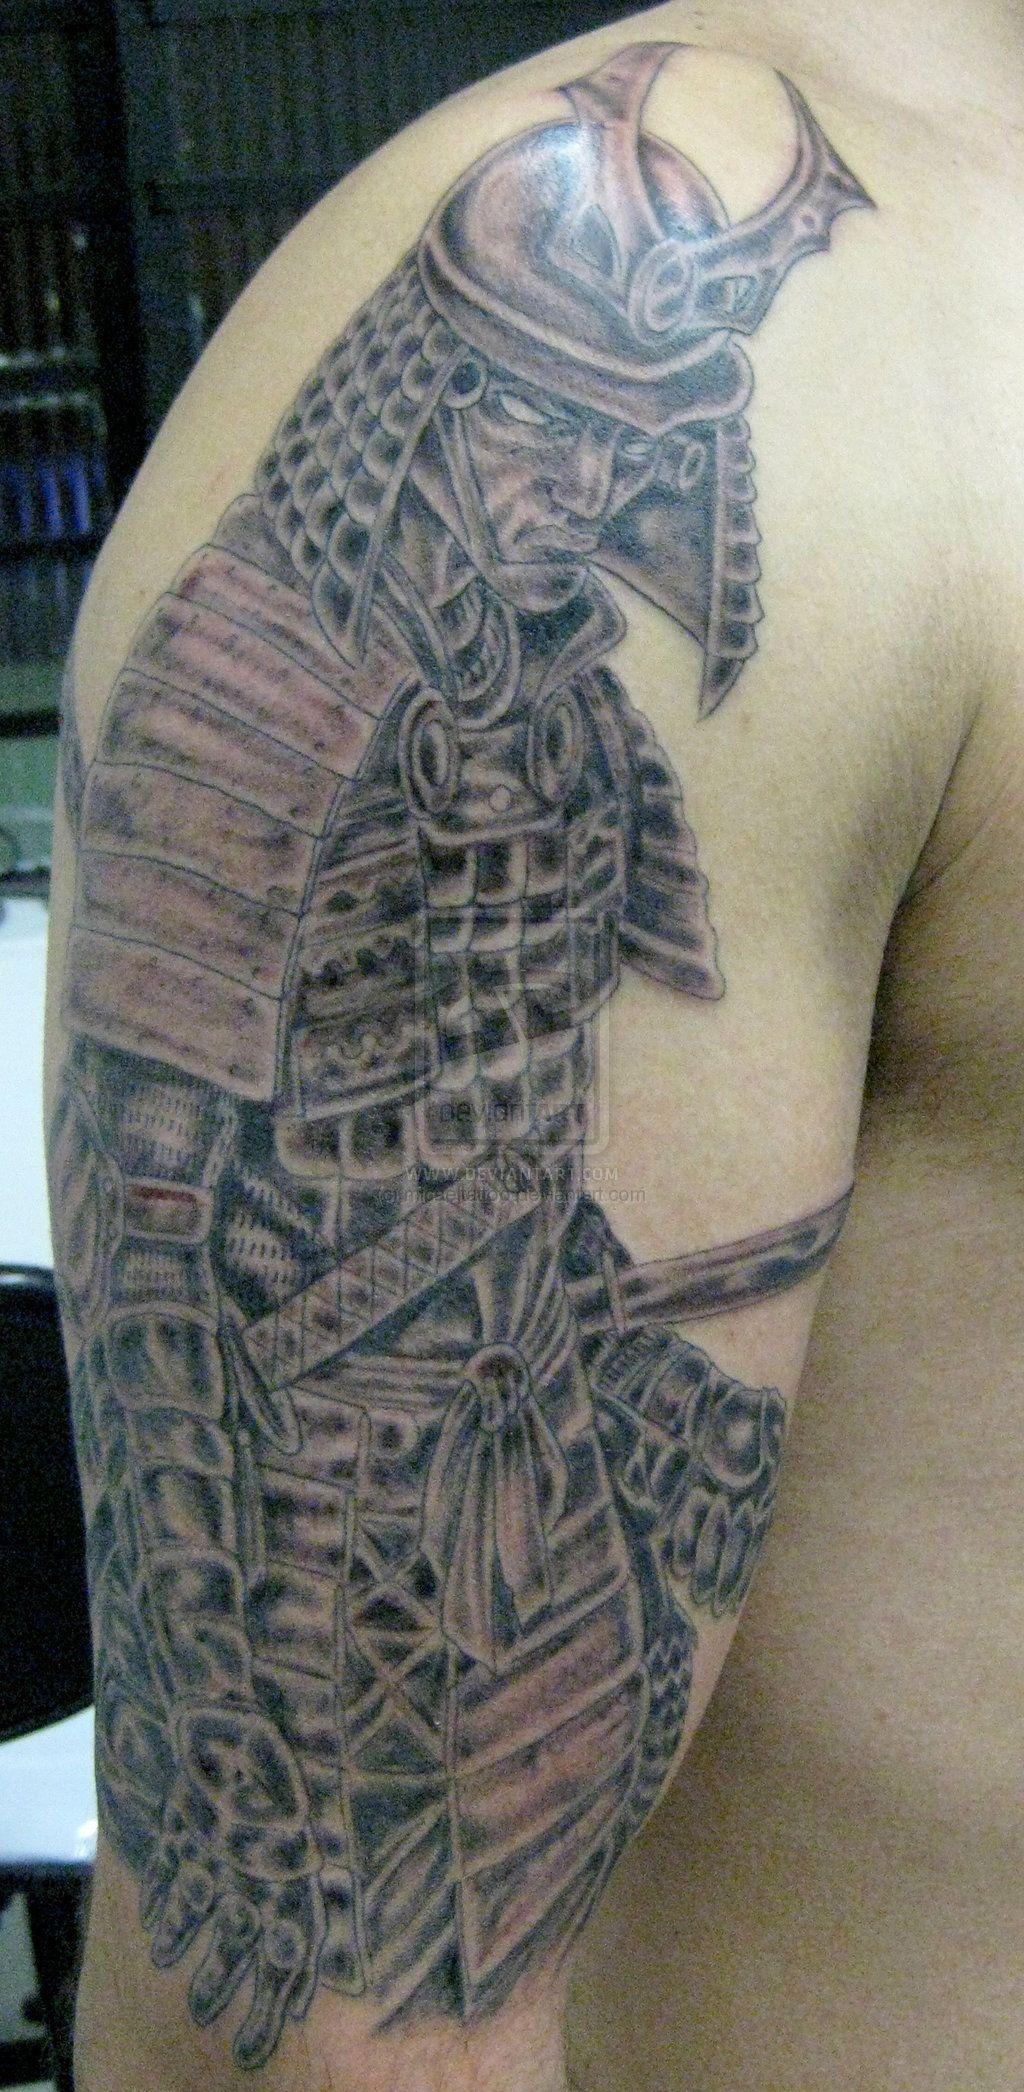 Samurai warrior tattoo full and half sleeve tattoos for Japanese war tattoos